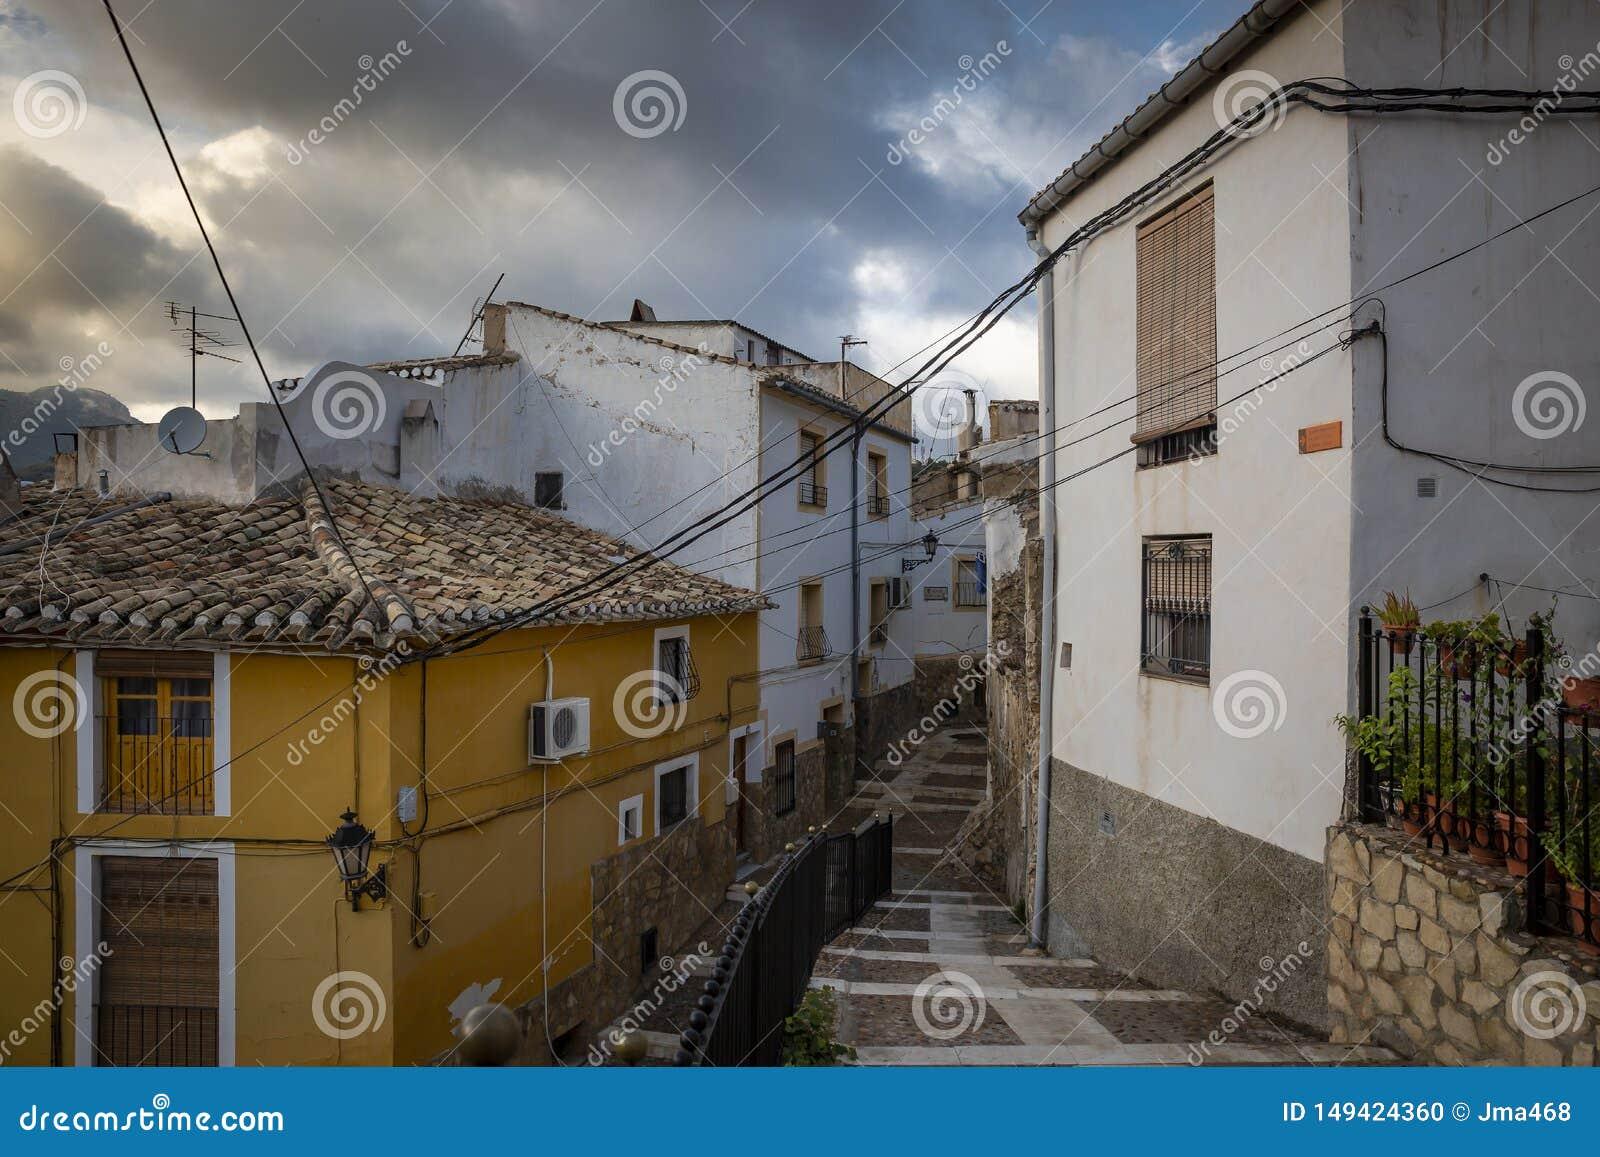 Eine Straße in heiliger Stadt Caravaca de la Cruz